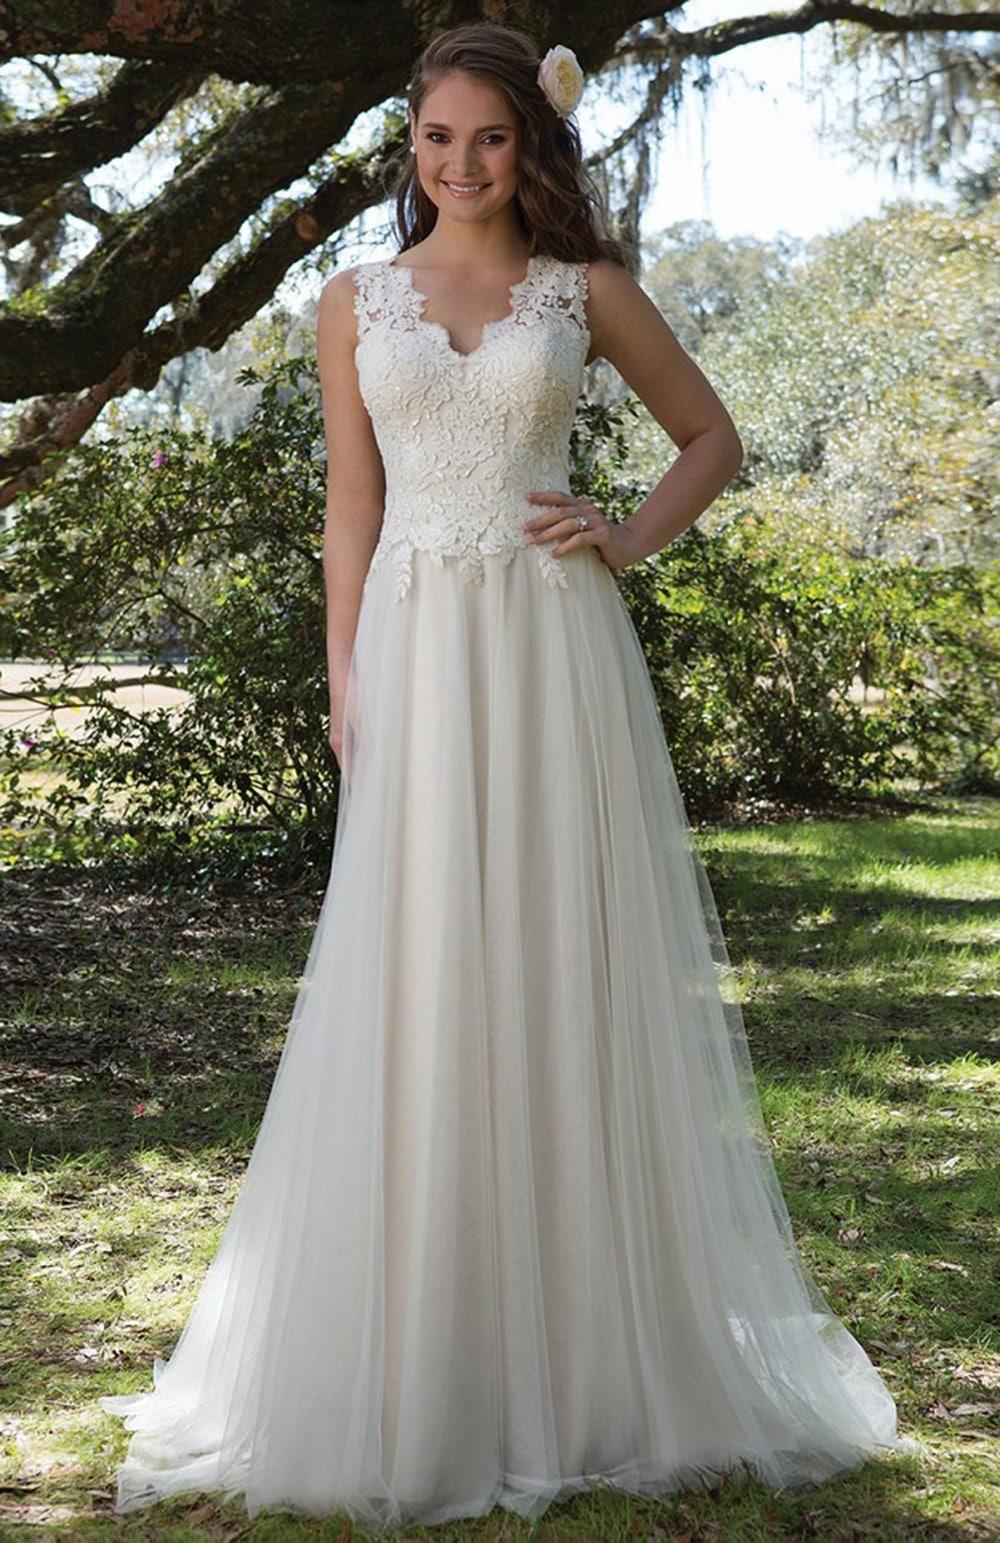 Robe de mariée Modèle Tina